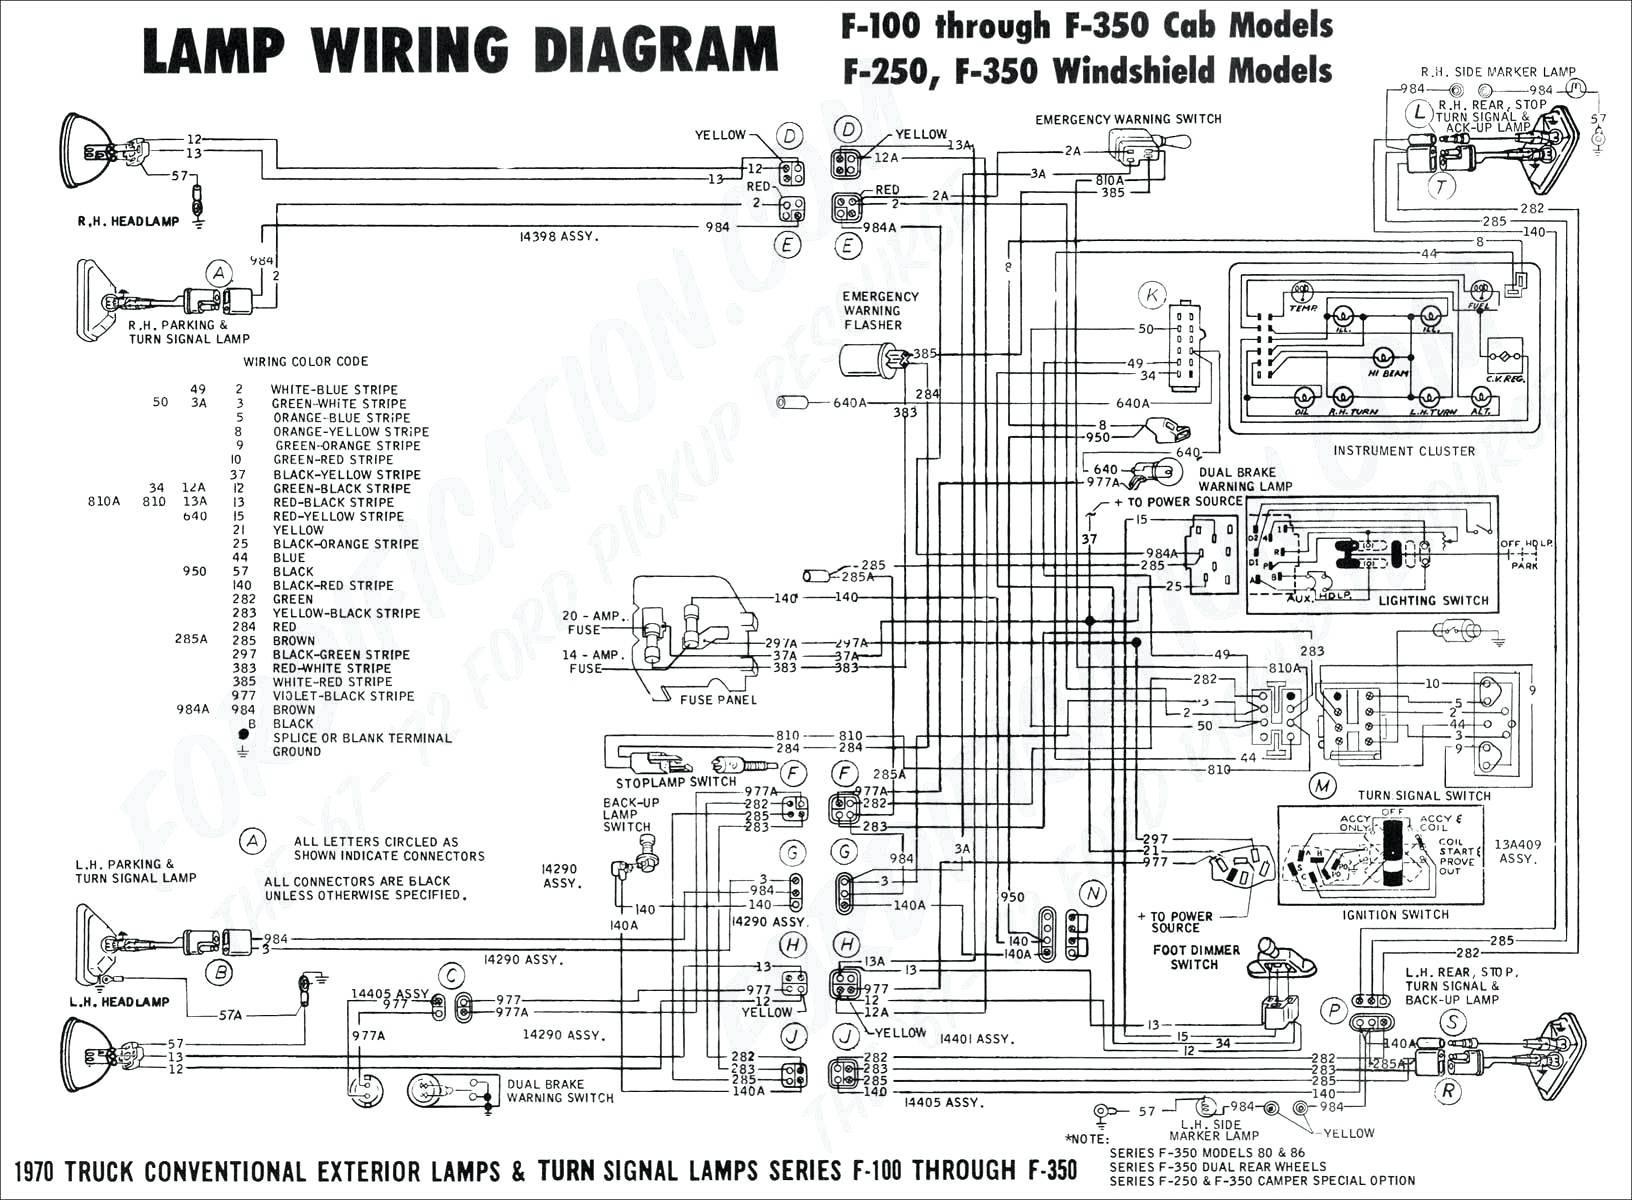 Honda foreman 450 Parts Diagram tommy Gate Wiring Diagram Data Schematics Wiring Diagram • Of Honda foreman 450 Parts Diagram